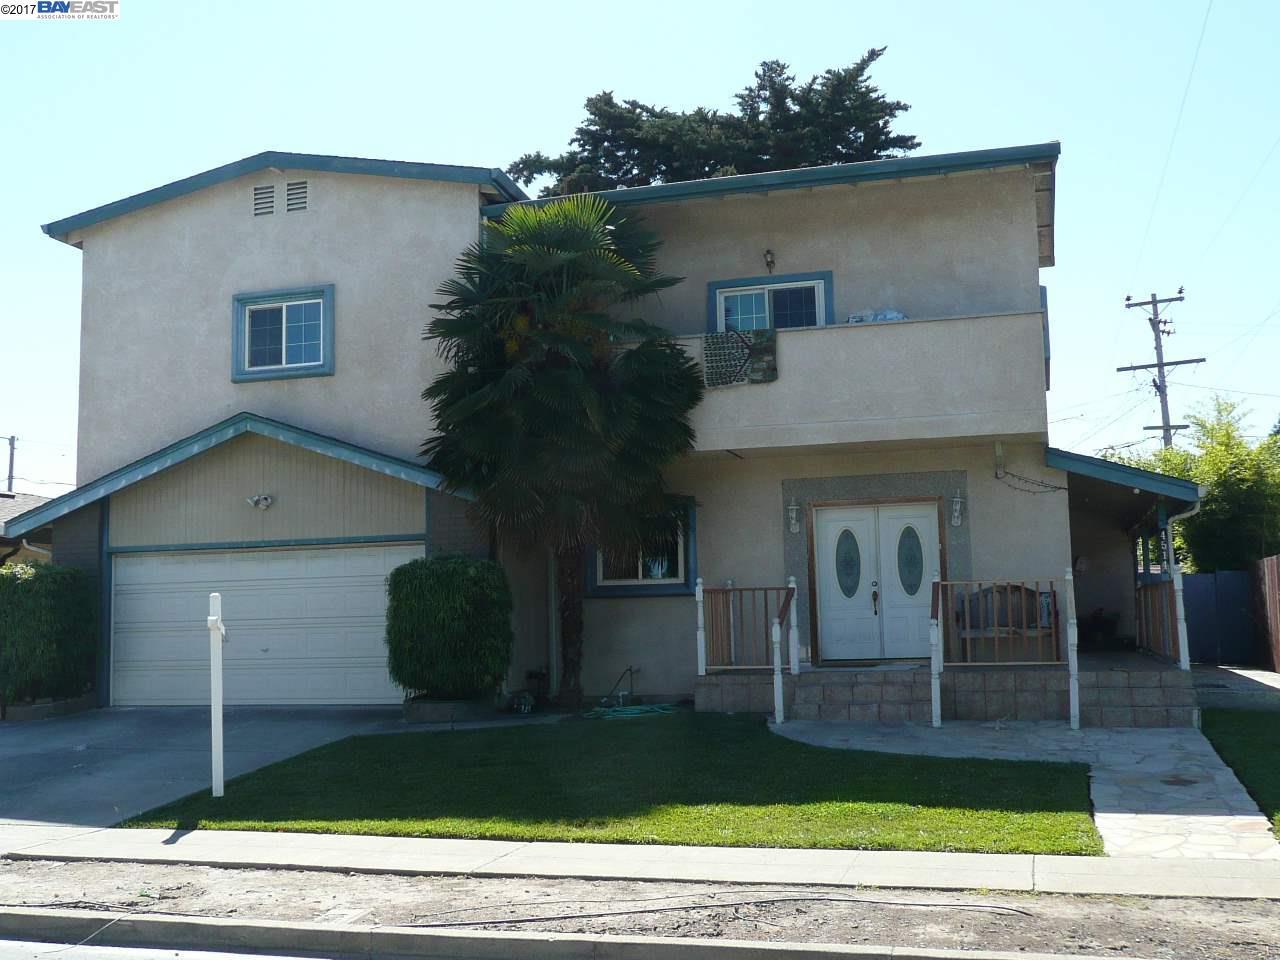 4514 Sloat Rd, FREMONT, CA 94538